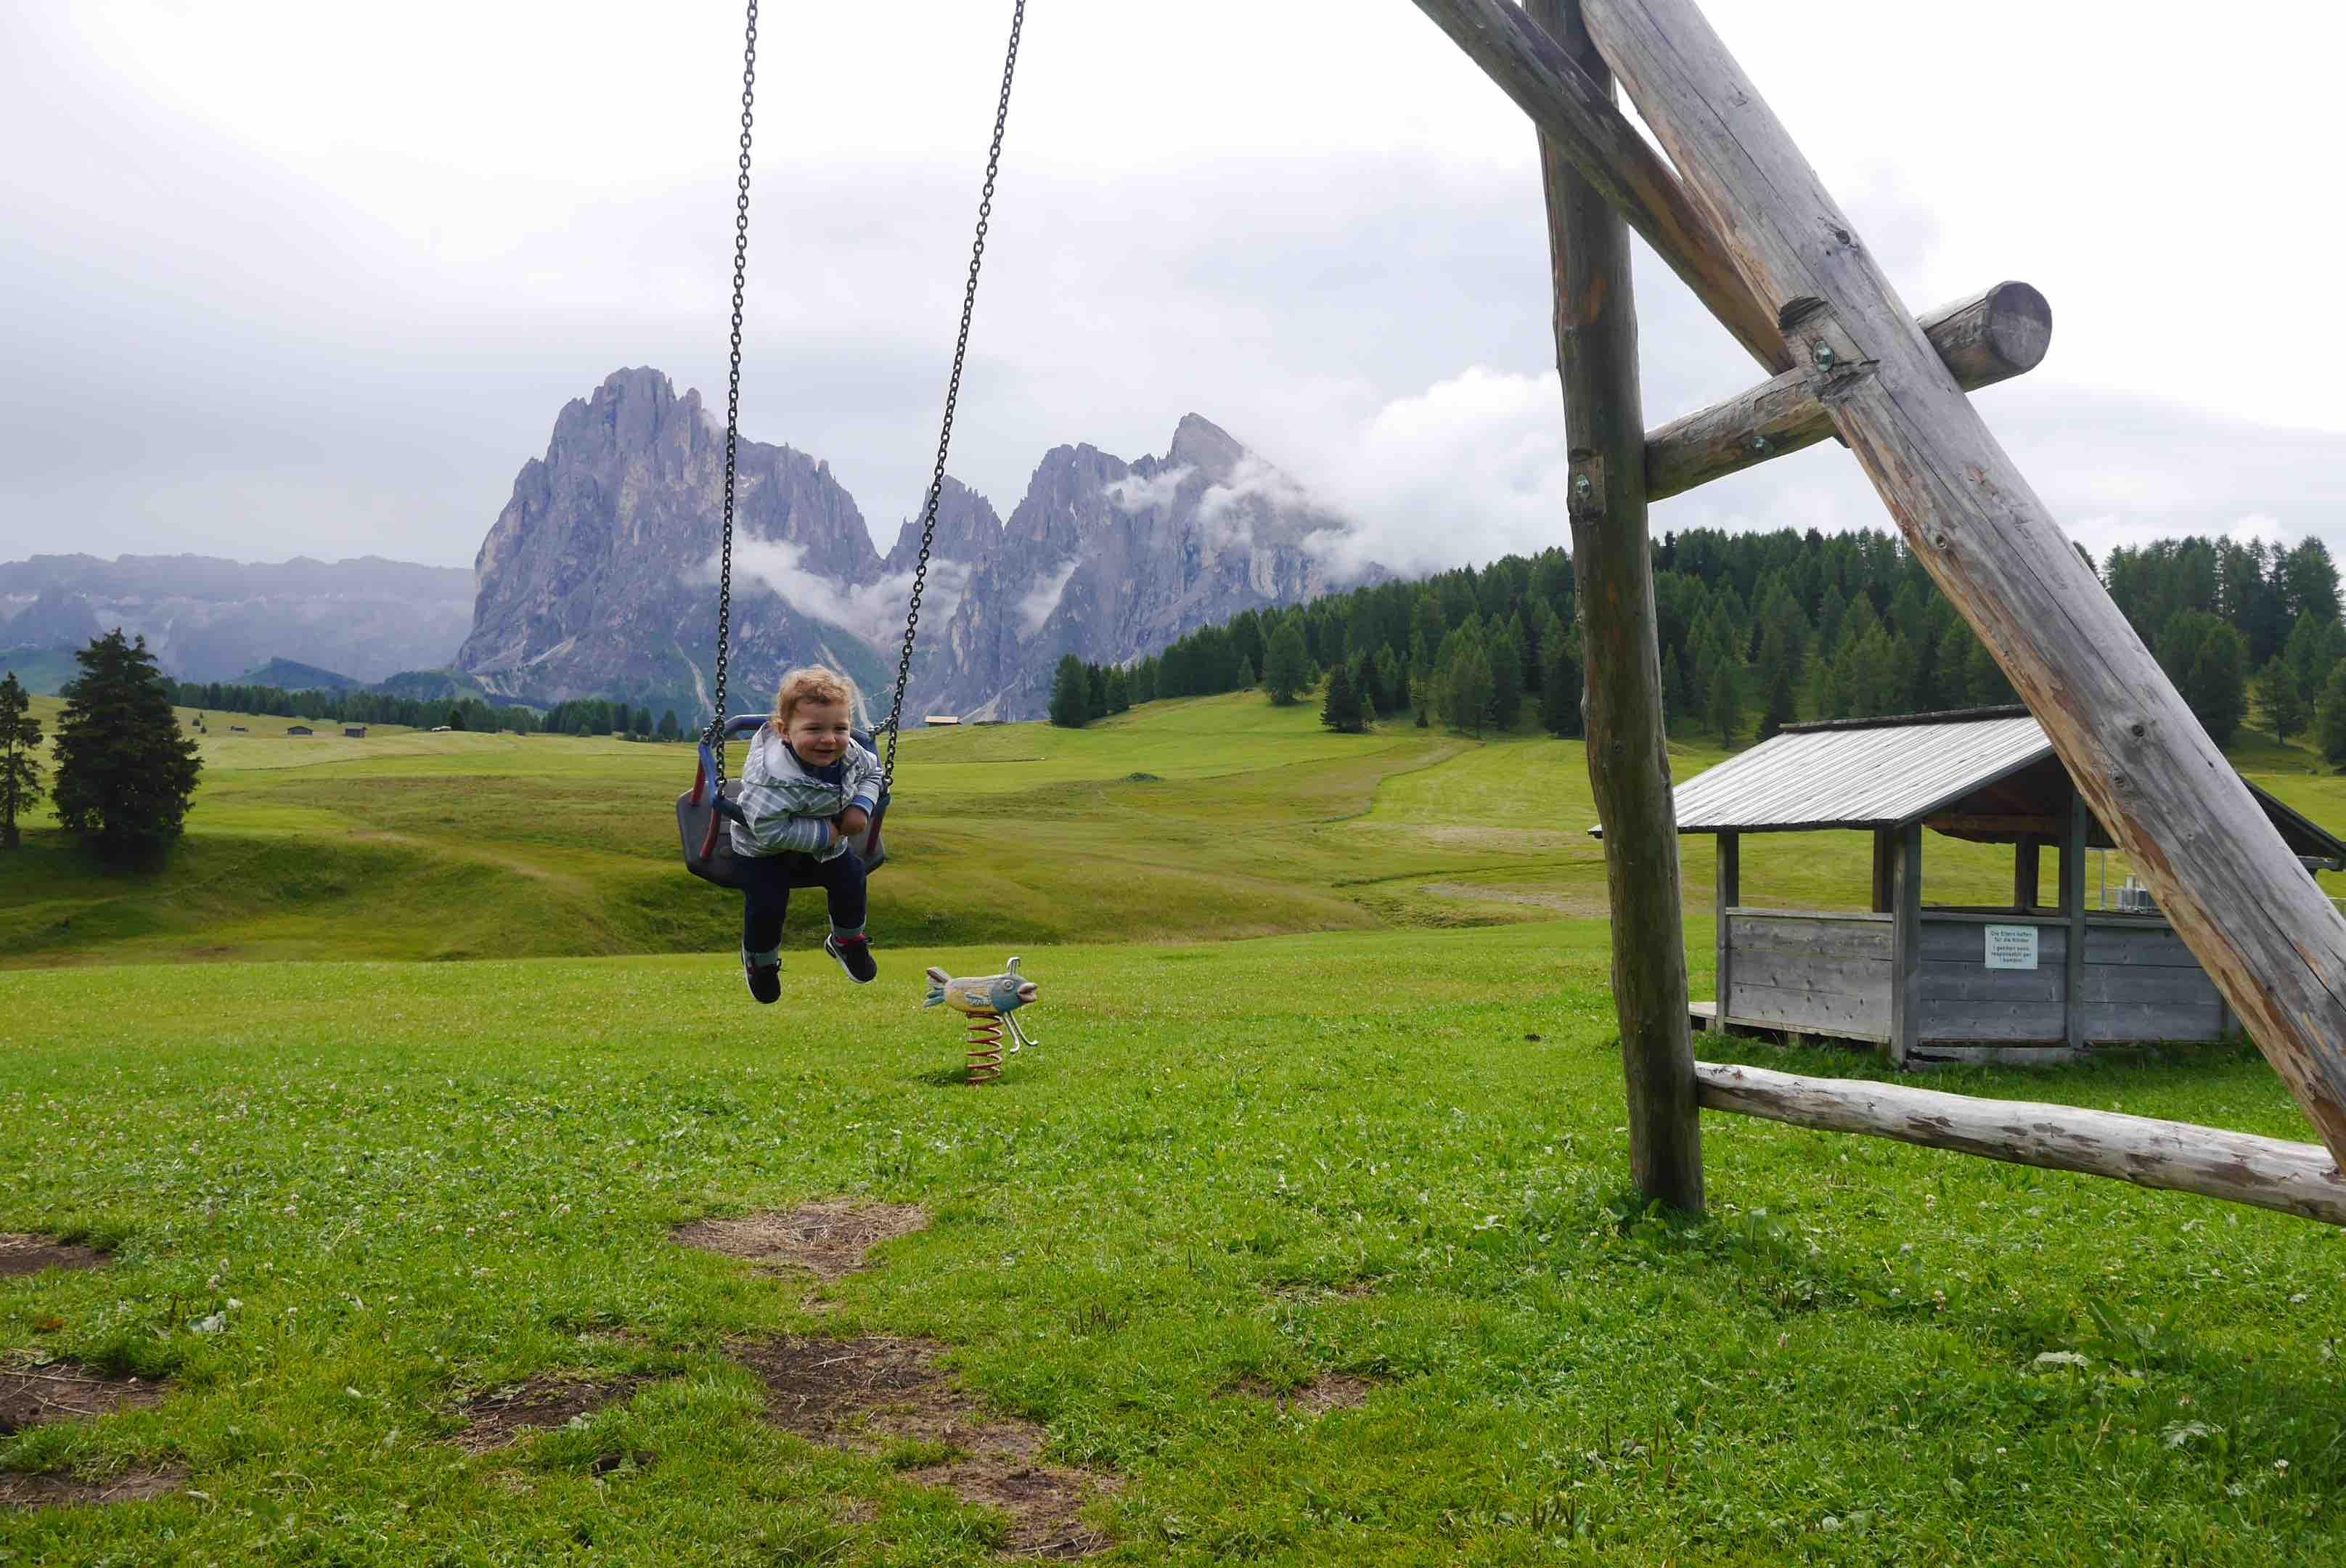 montagne-italie-ali-di-firenze